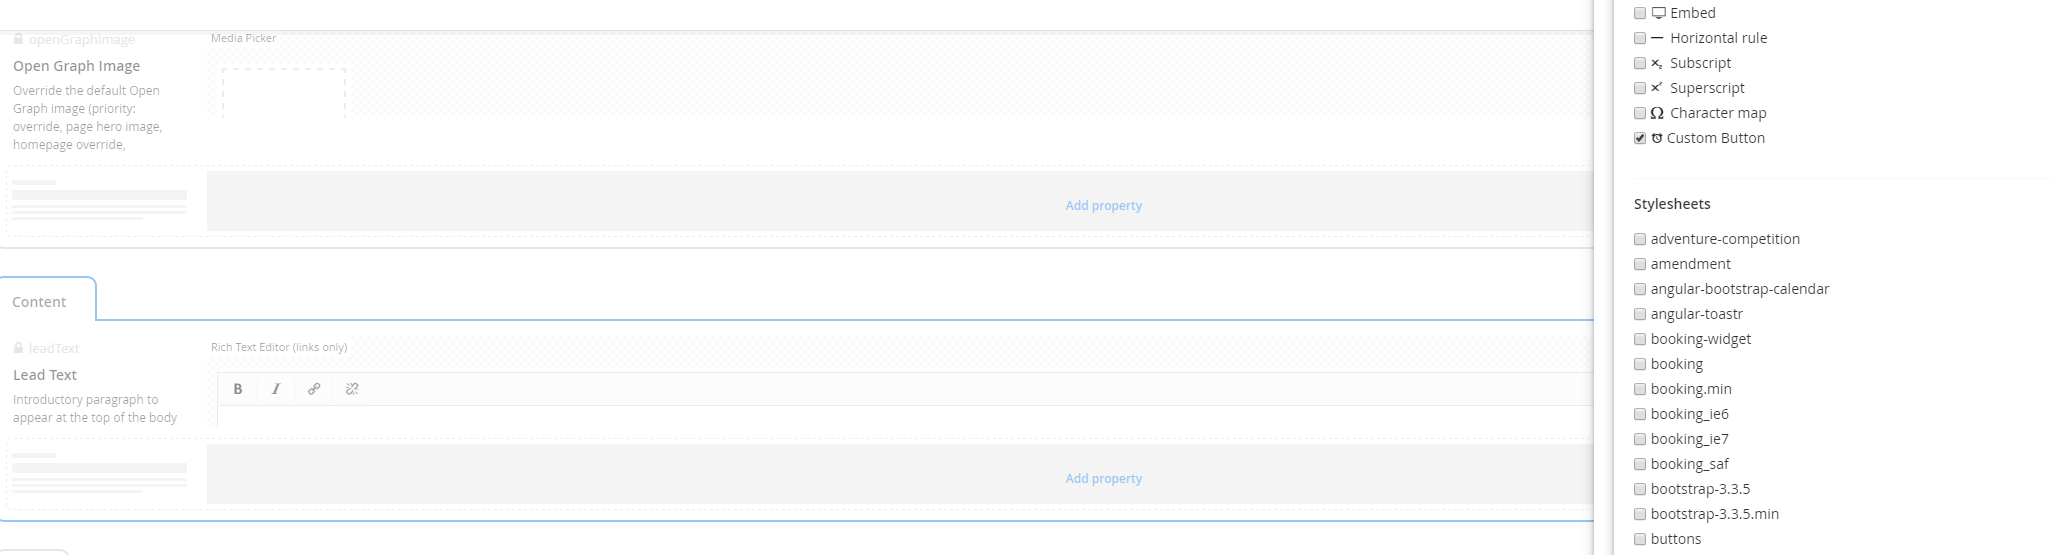 custom grid editor rich text custom button - Extending